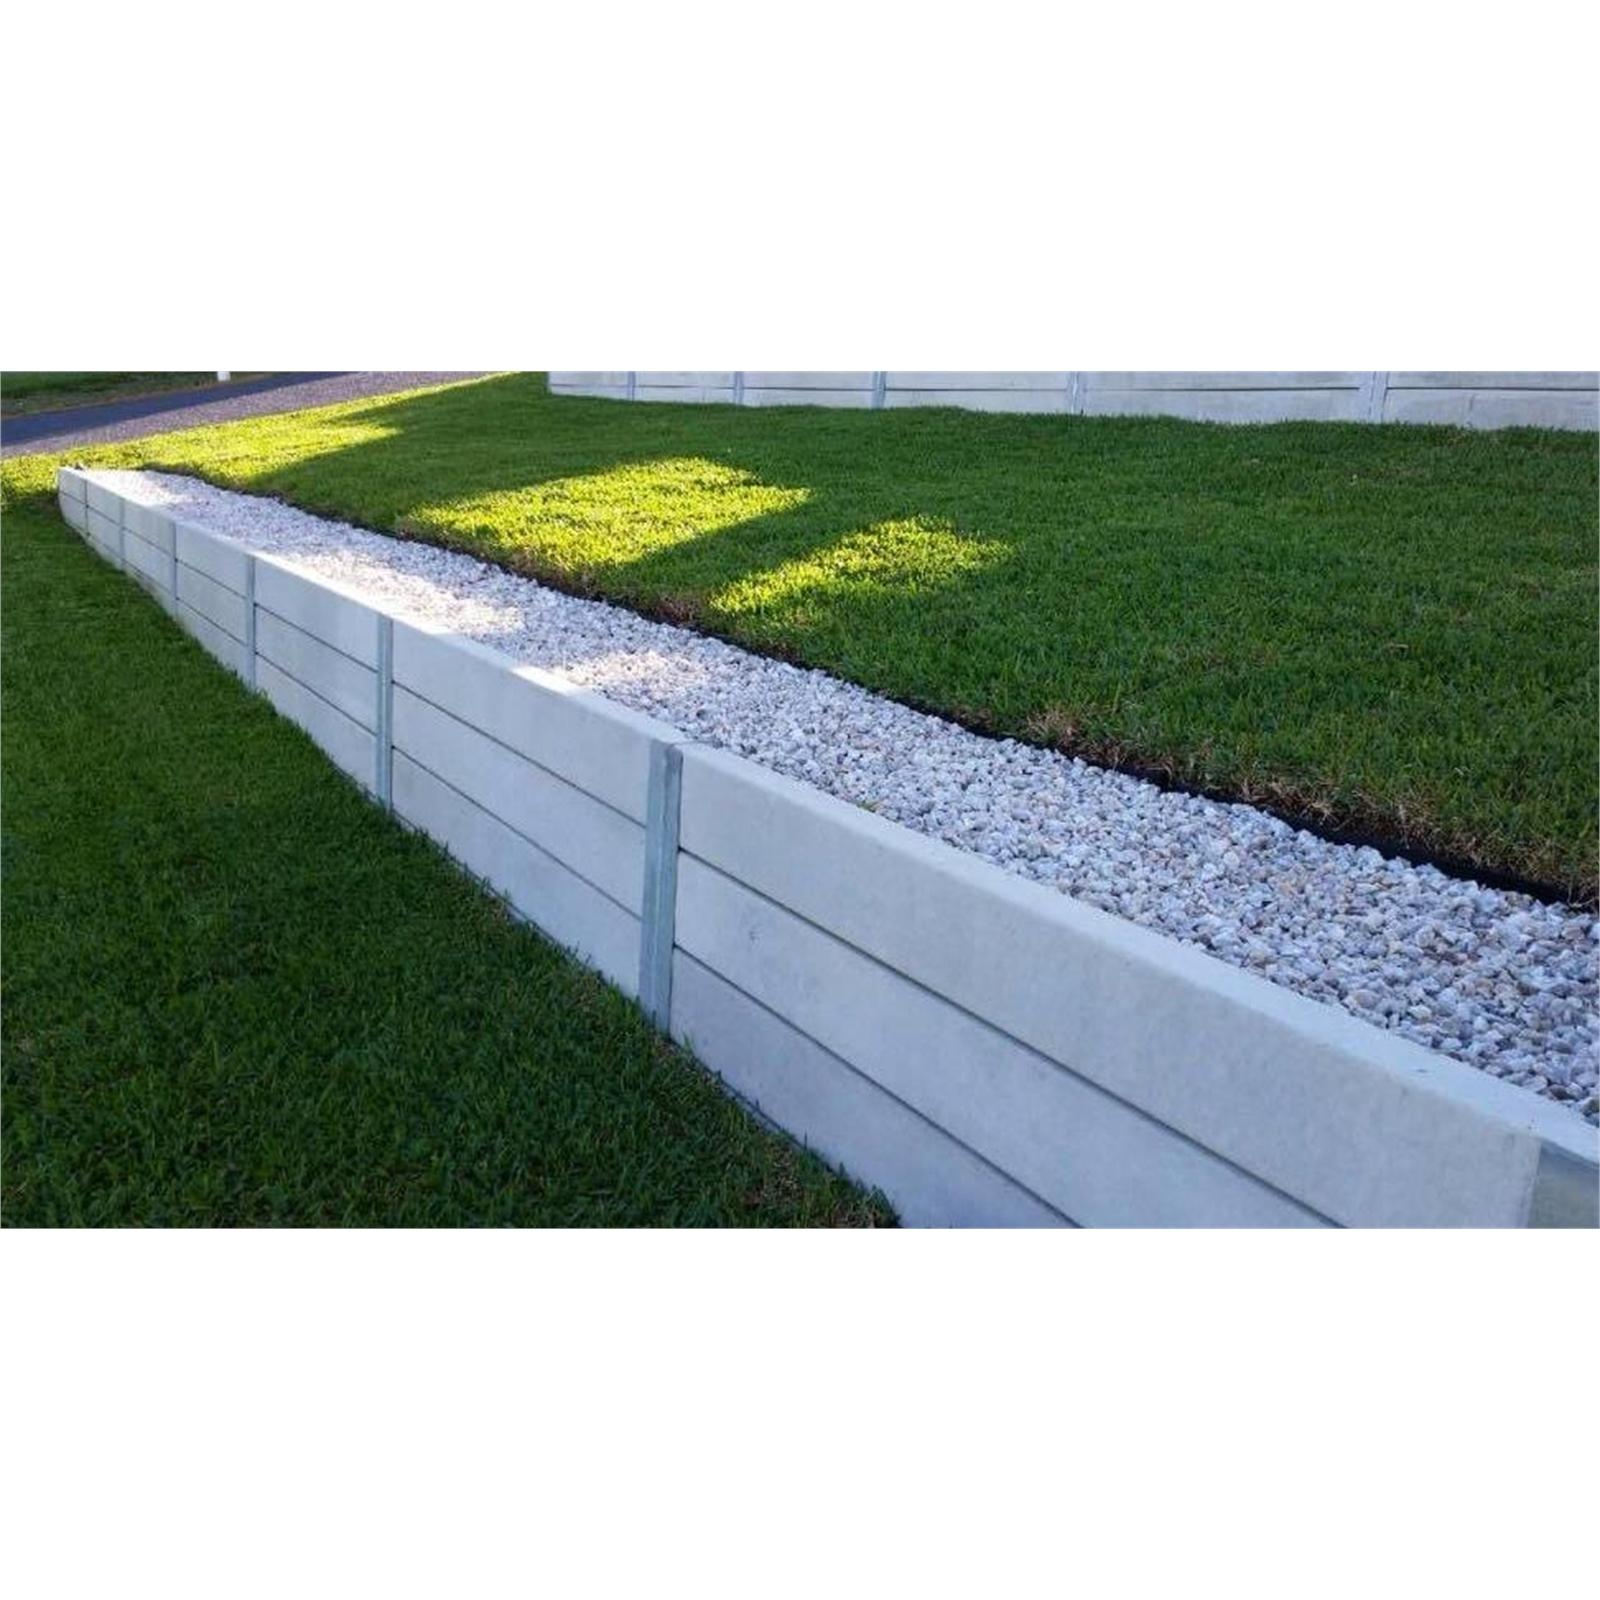 Ridgi 20 x 20mm x 20.20m Smooth Grey Reinforced Concrete Sleeper ...